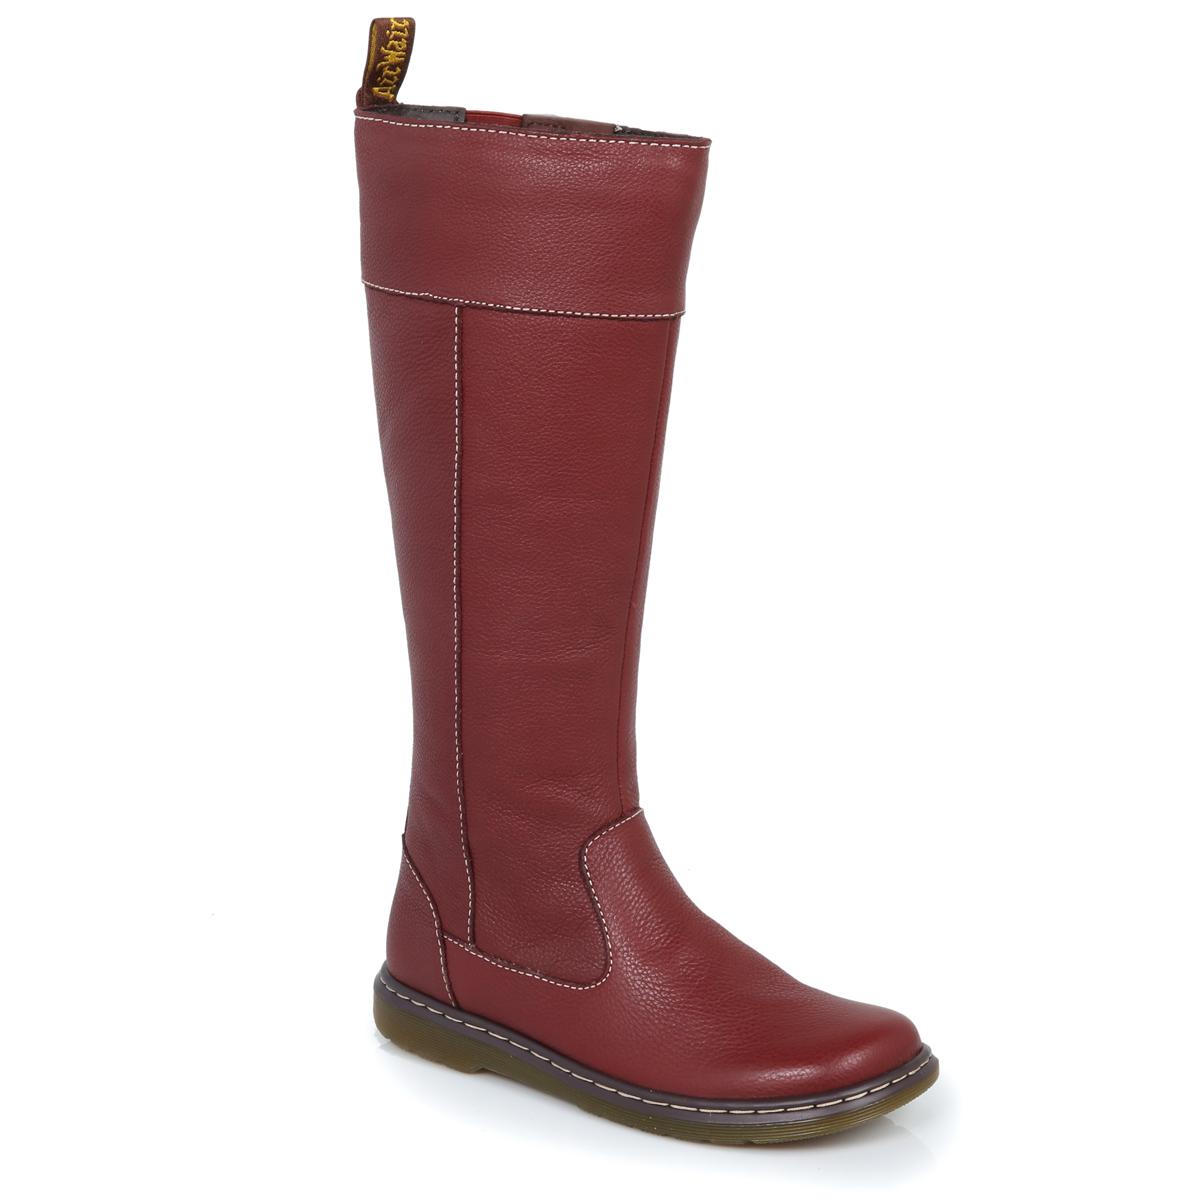 Dr Martens Cherry Mayen Leather Boots Womens sizes 3-9 | eBay